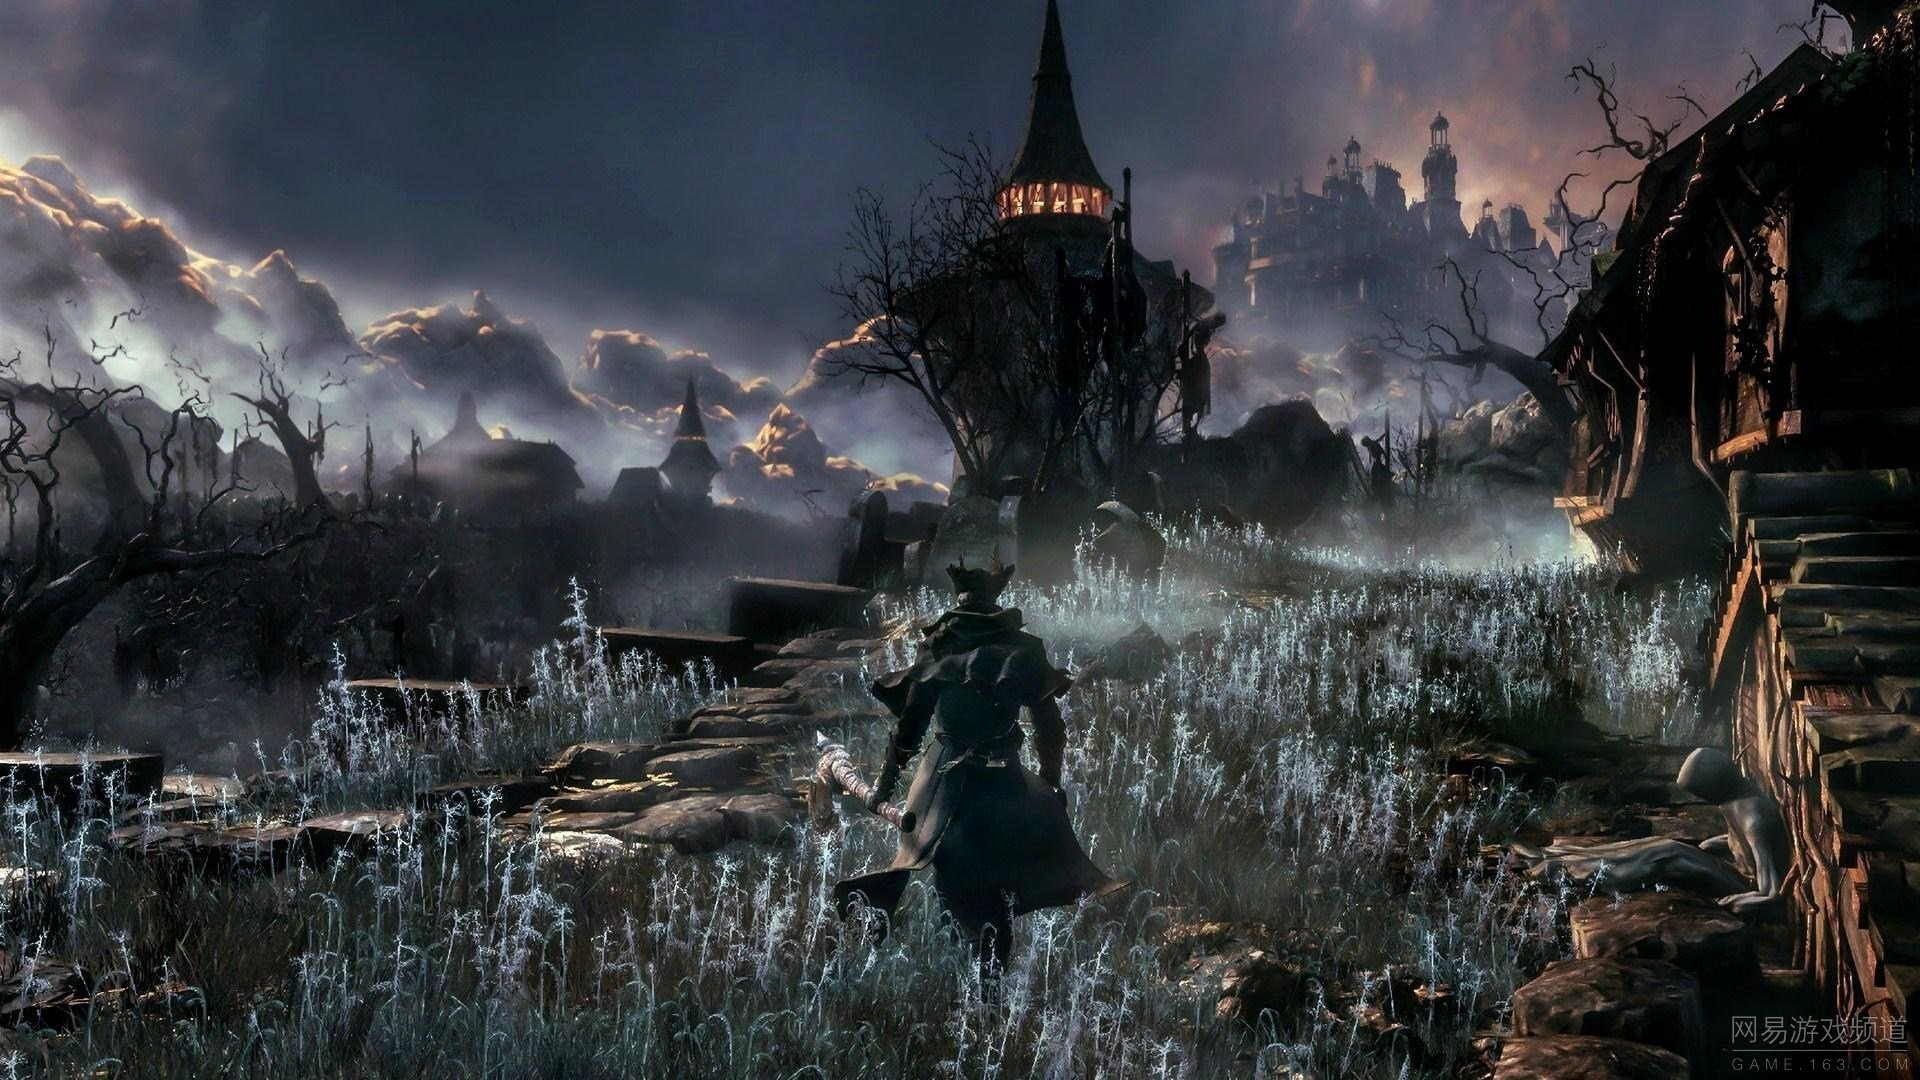 Dark Souls III Wallpaper 8 by DrAlucard on DeviantArt